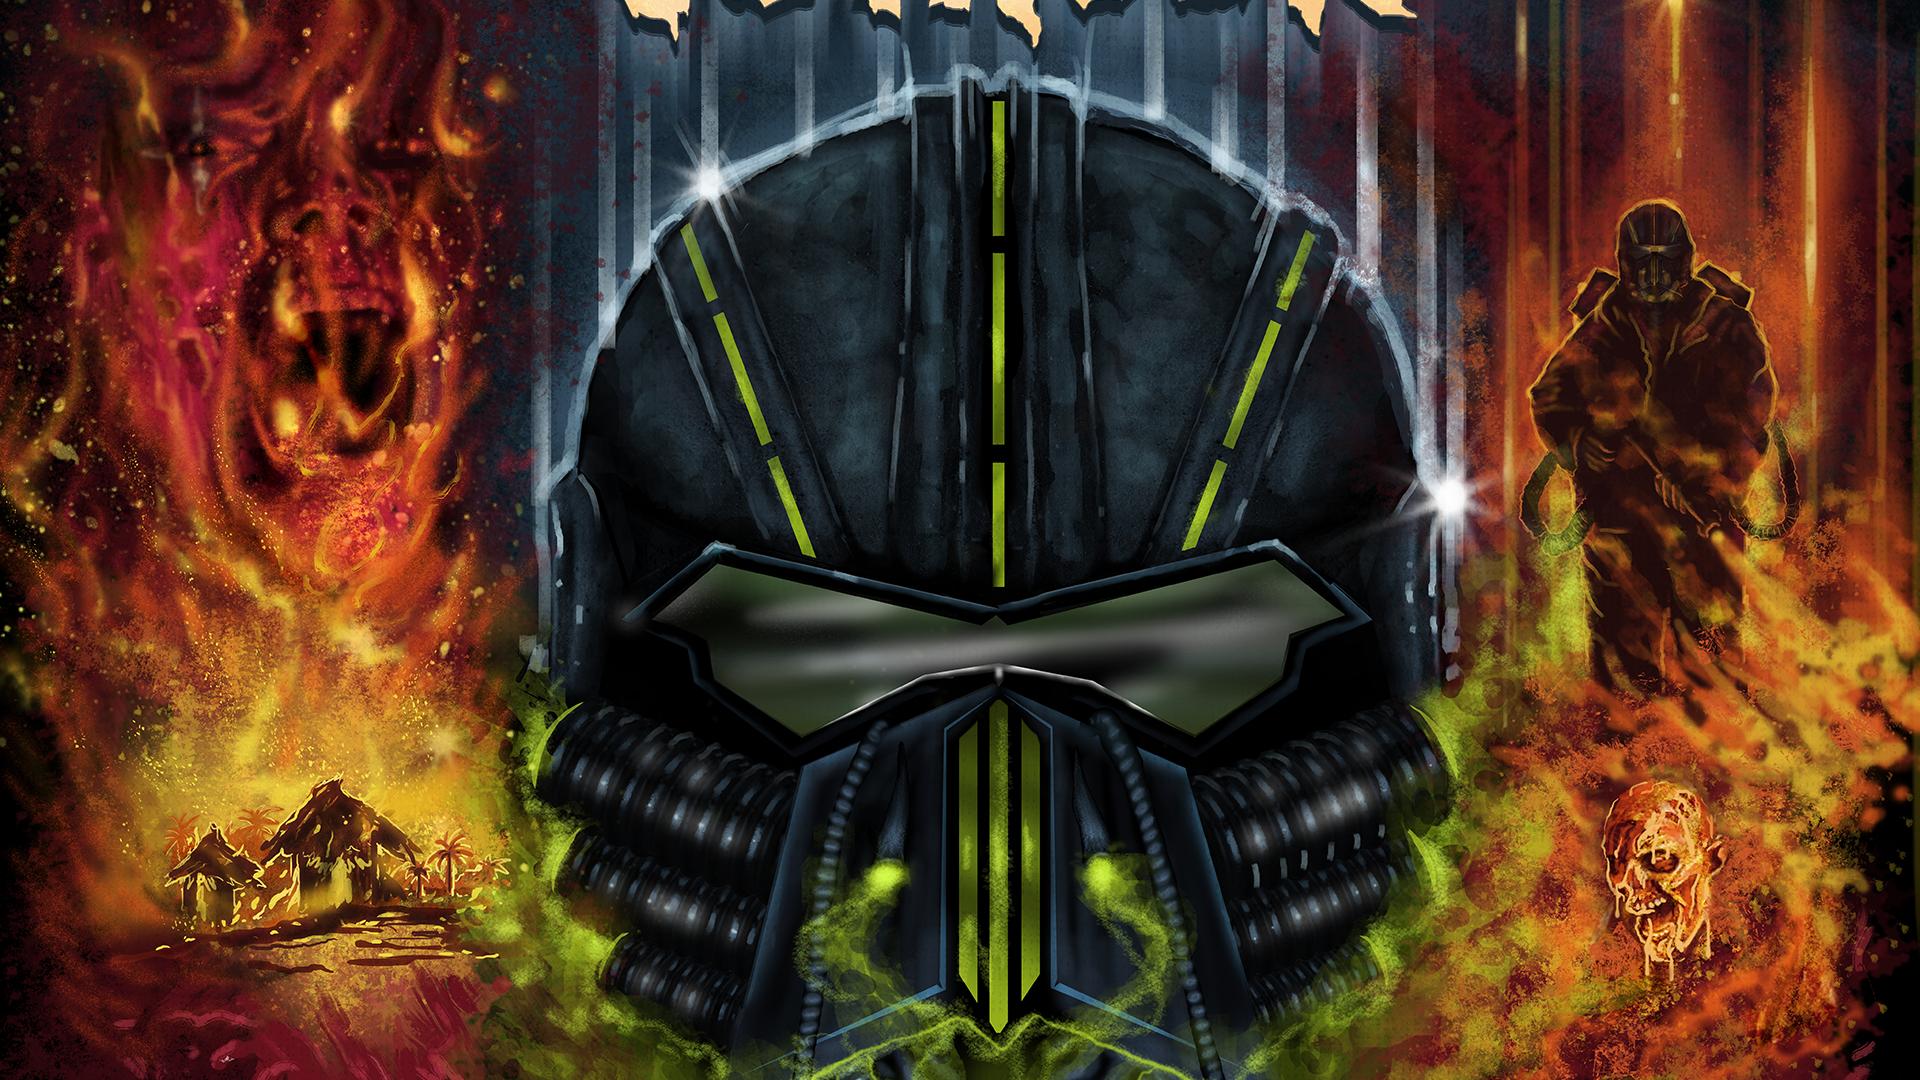 Voyag3r New York Ninja - Original Motion Picture Soundtrack